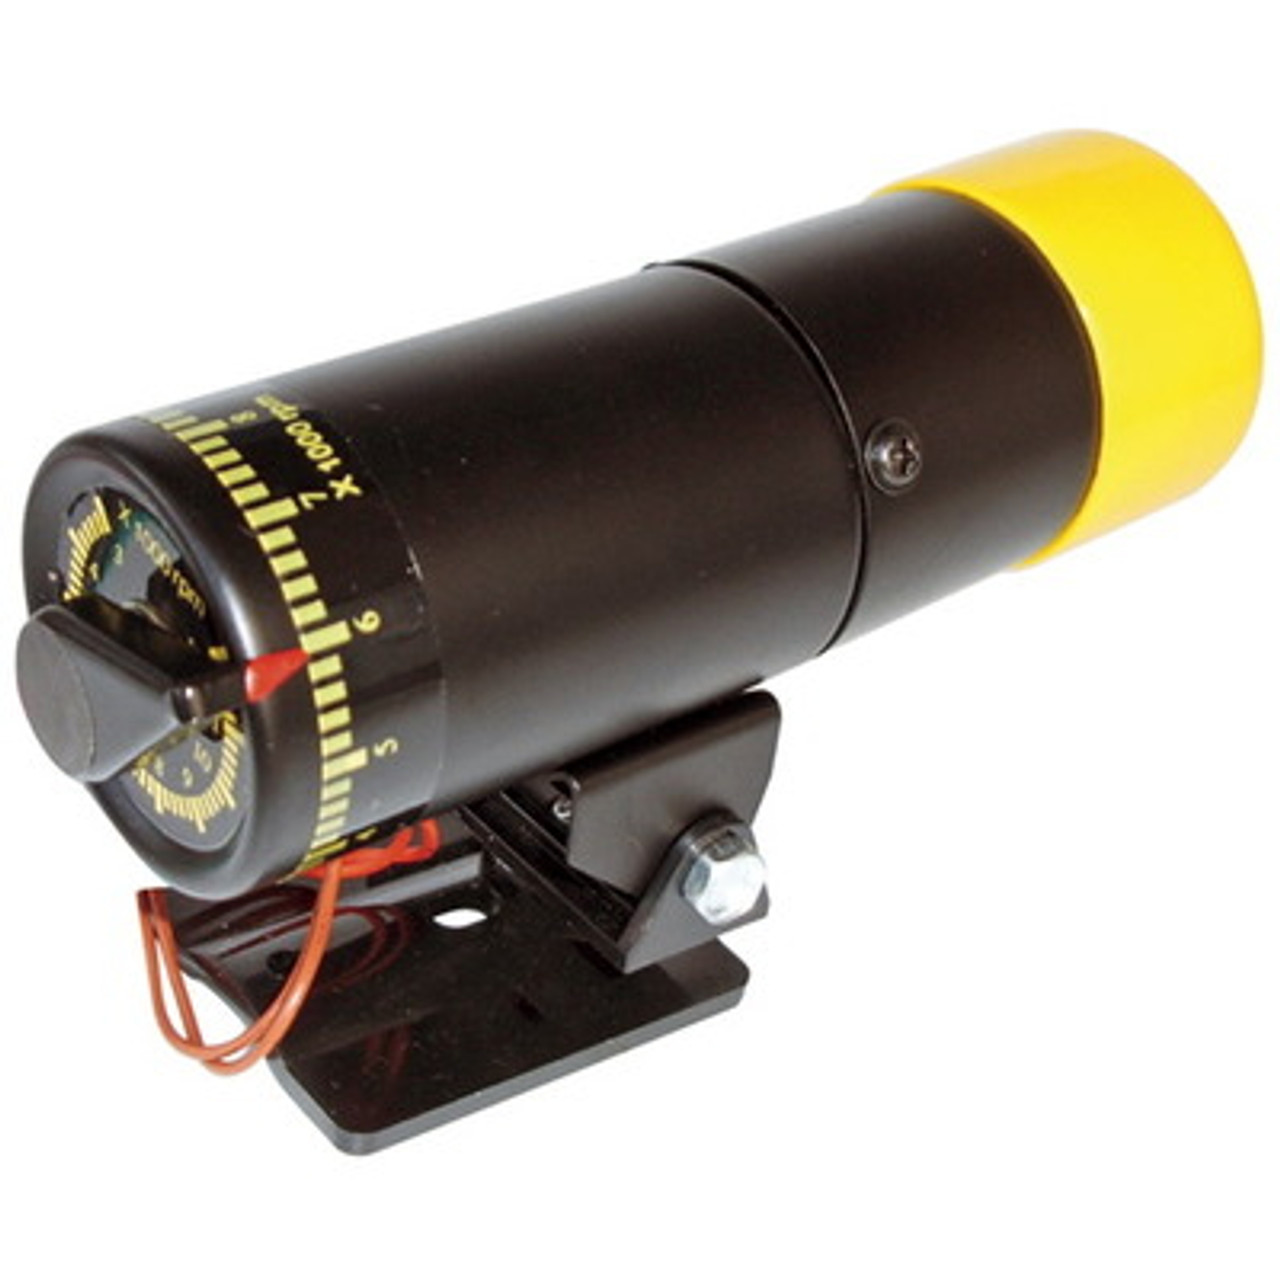 PFM67005C, ADJUSTABLE SHIFT LIGHT  3000-12000 RPM BLACK